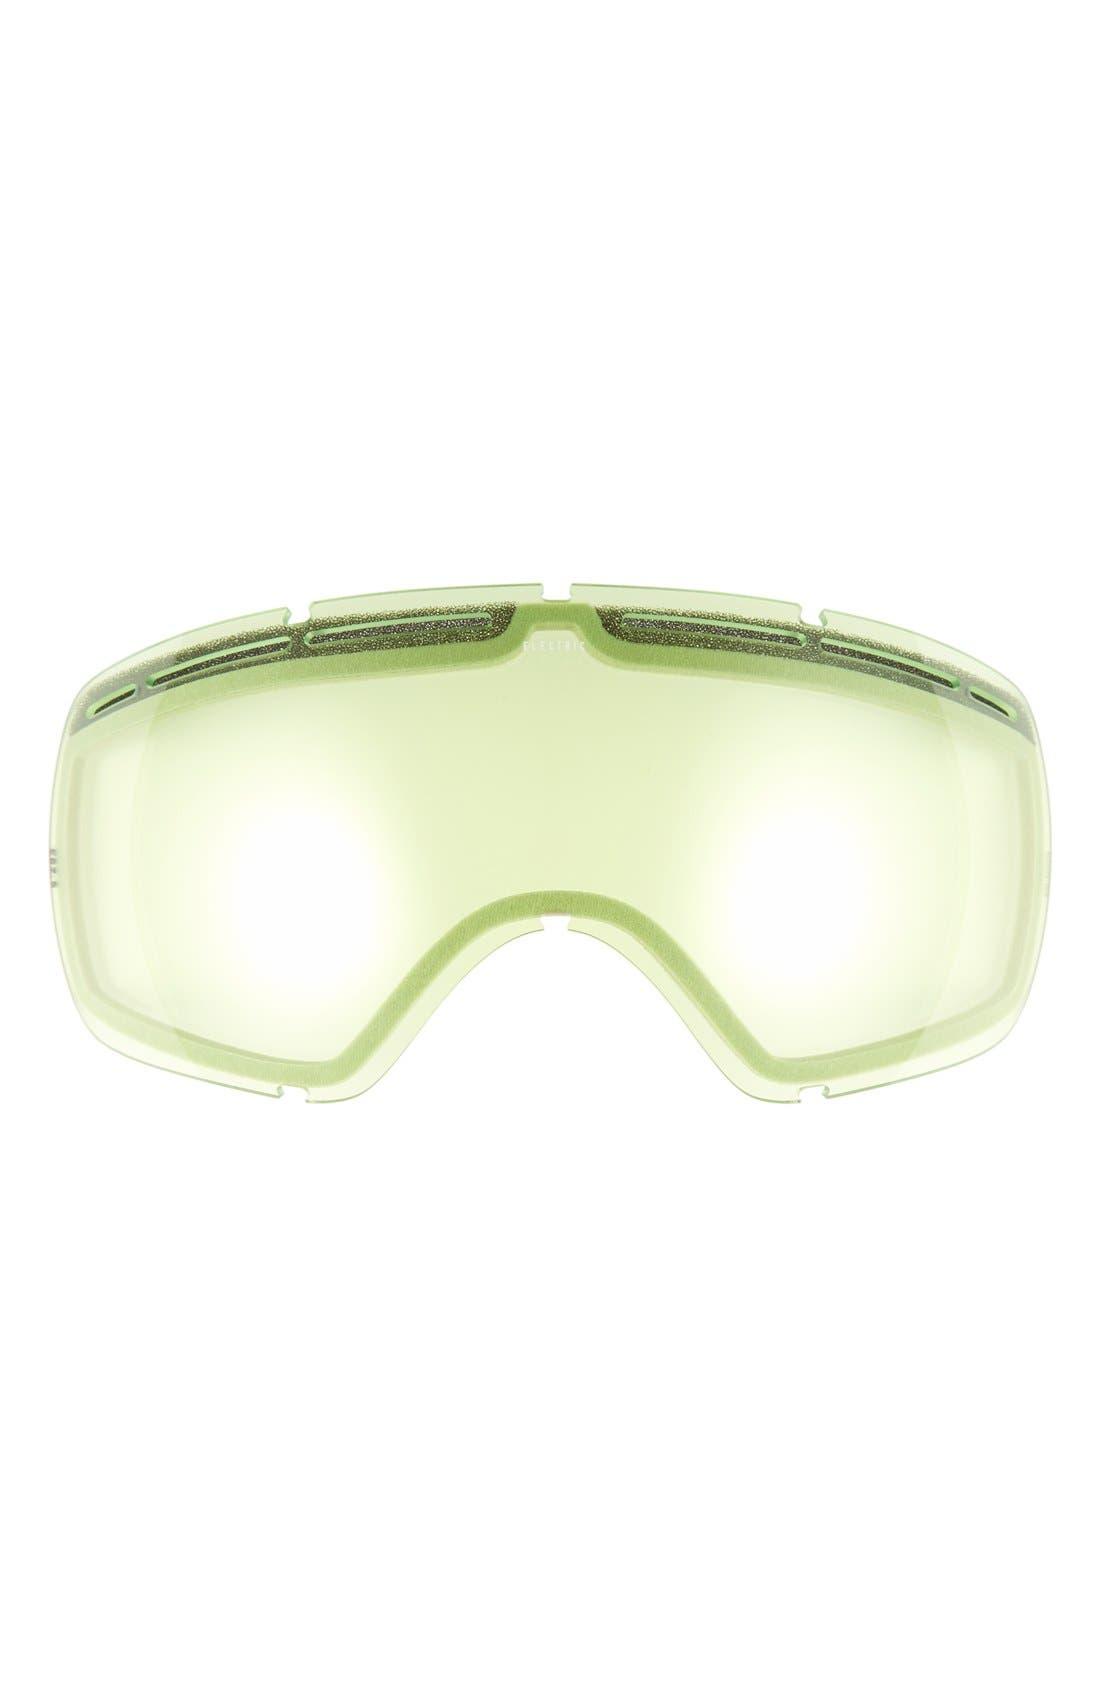 EG 2.5 215mm Snow Goggles,                             Alternate thumbnail 24, color,